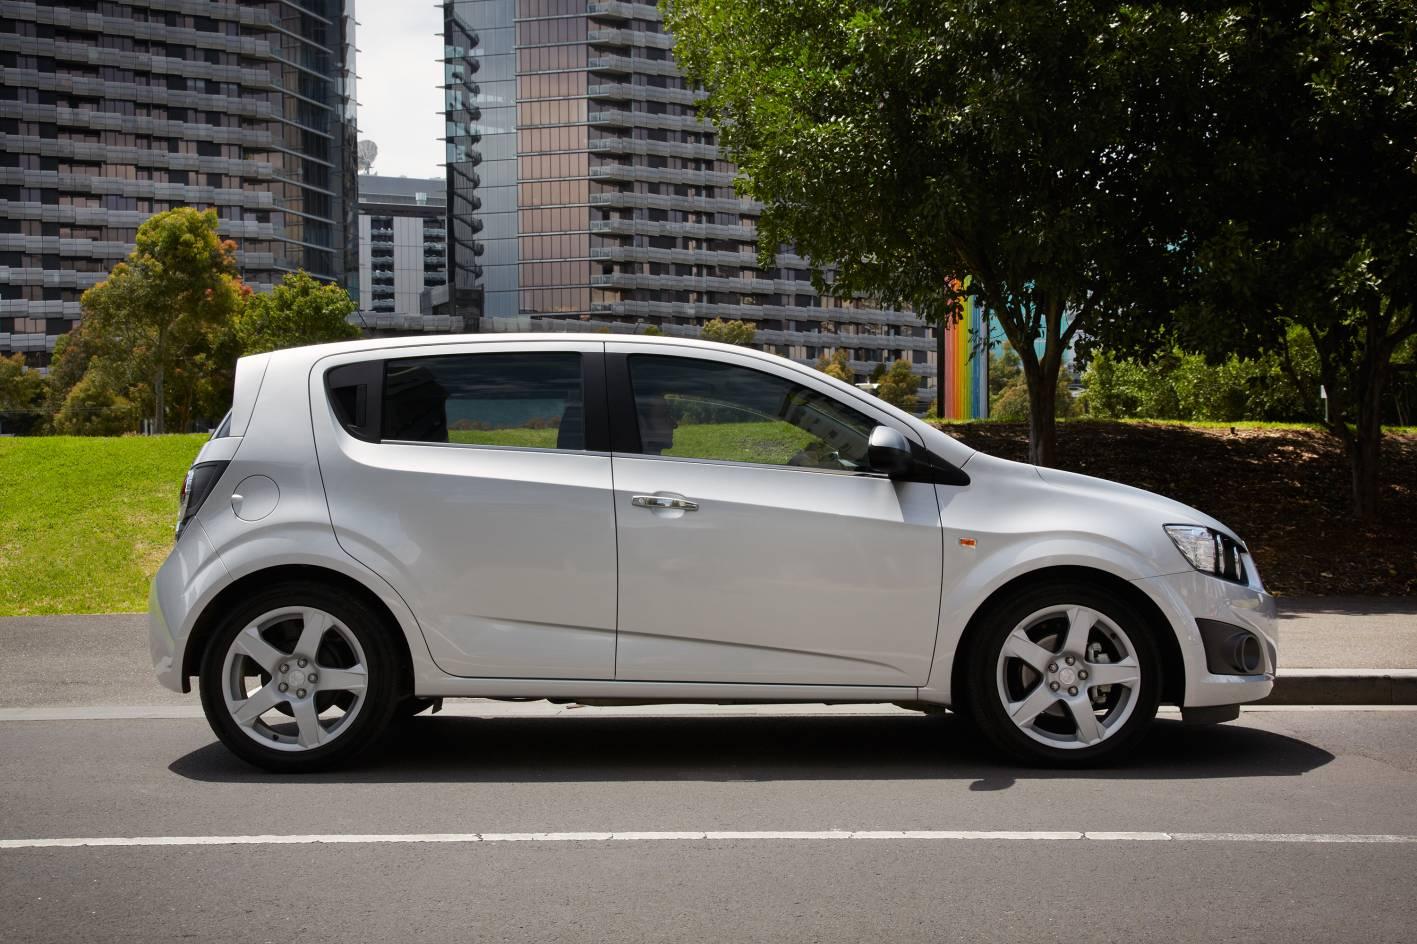 Mazda Cx 9 Dimensions >> Holden Barina Review: 2013 Barina Sedan and Hatch